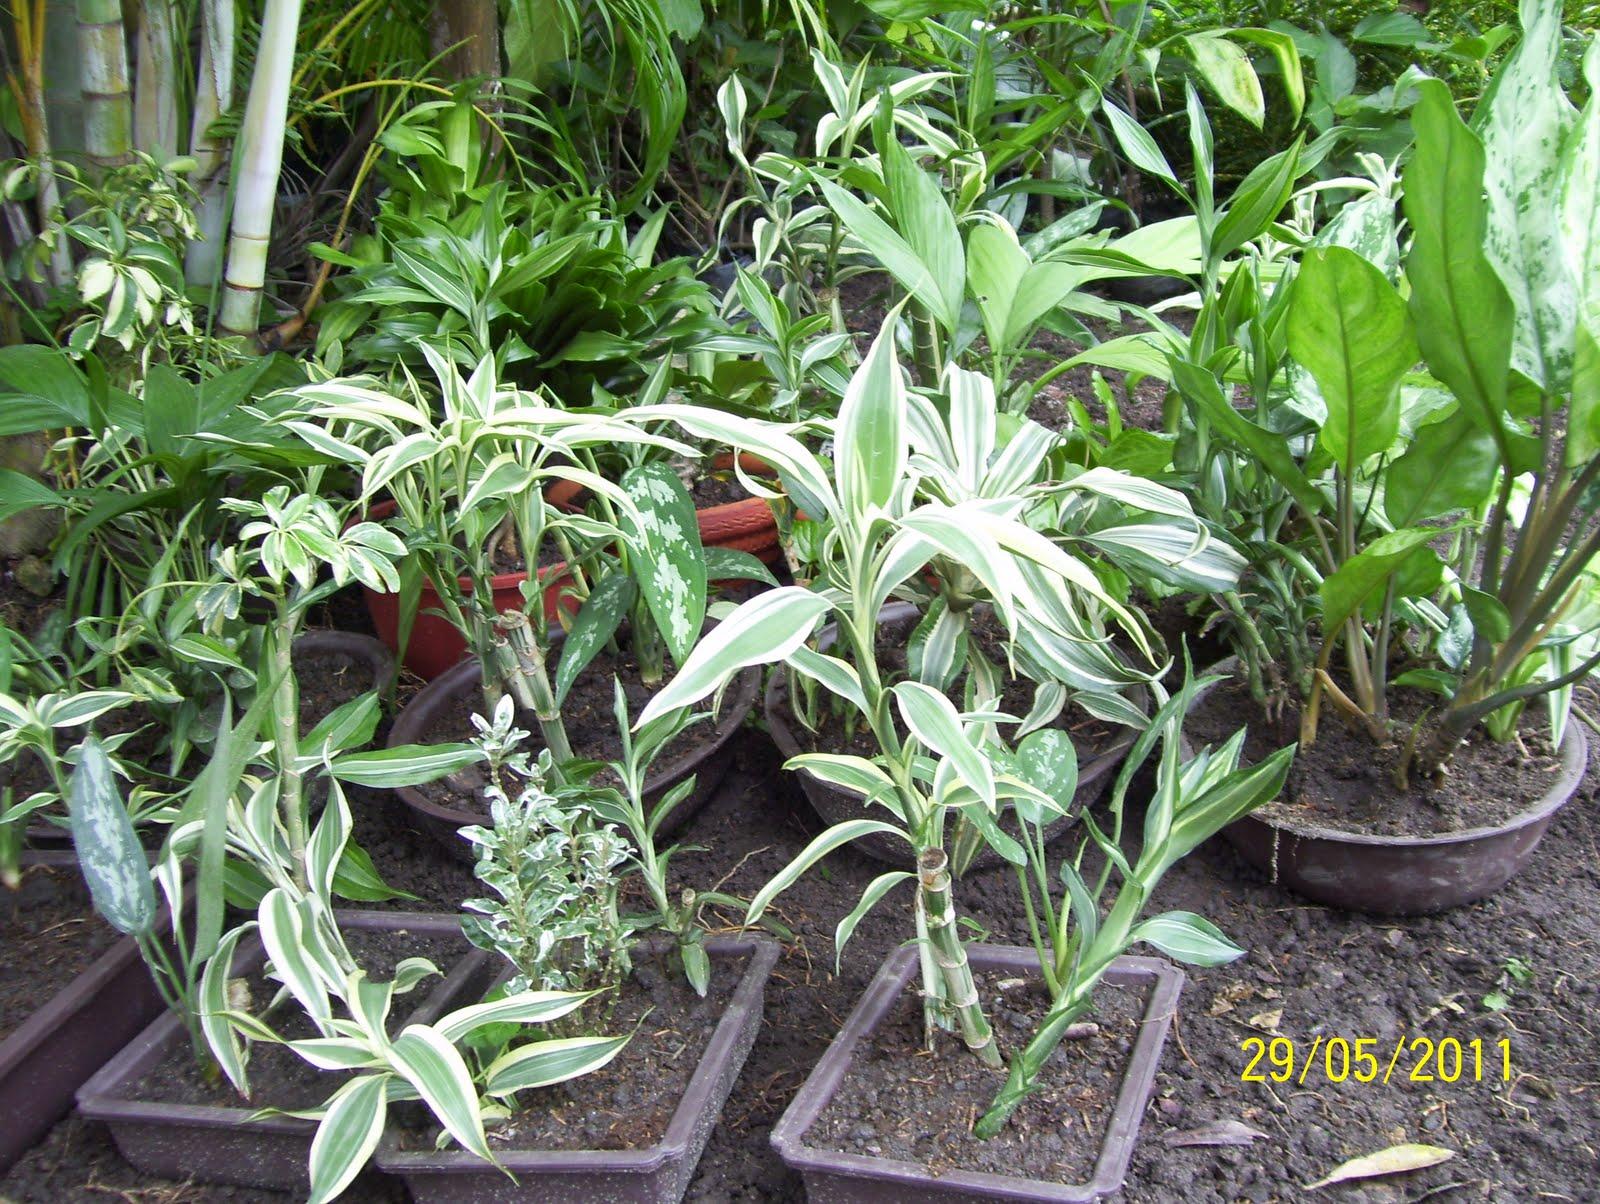 Vivero los chaguaramos plantas ornamentales for Vivero agronomia